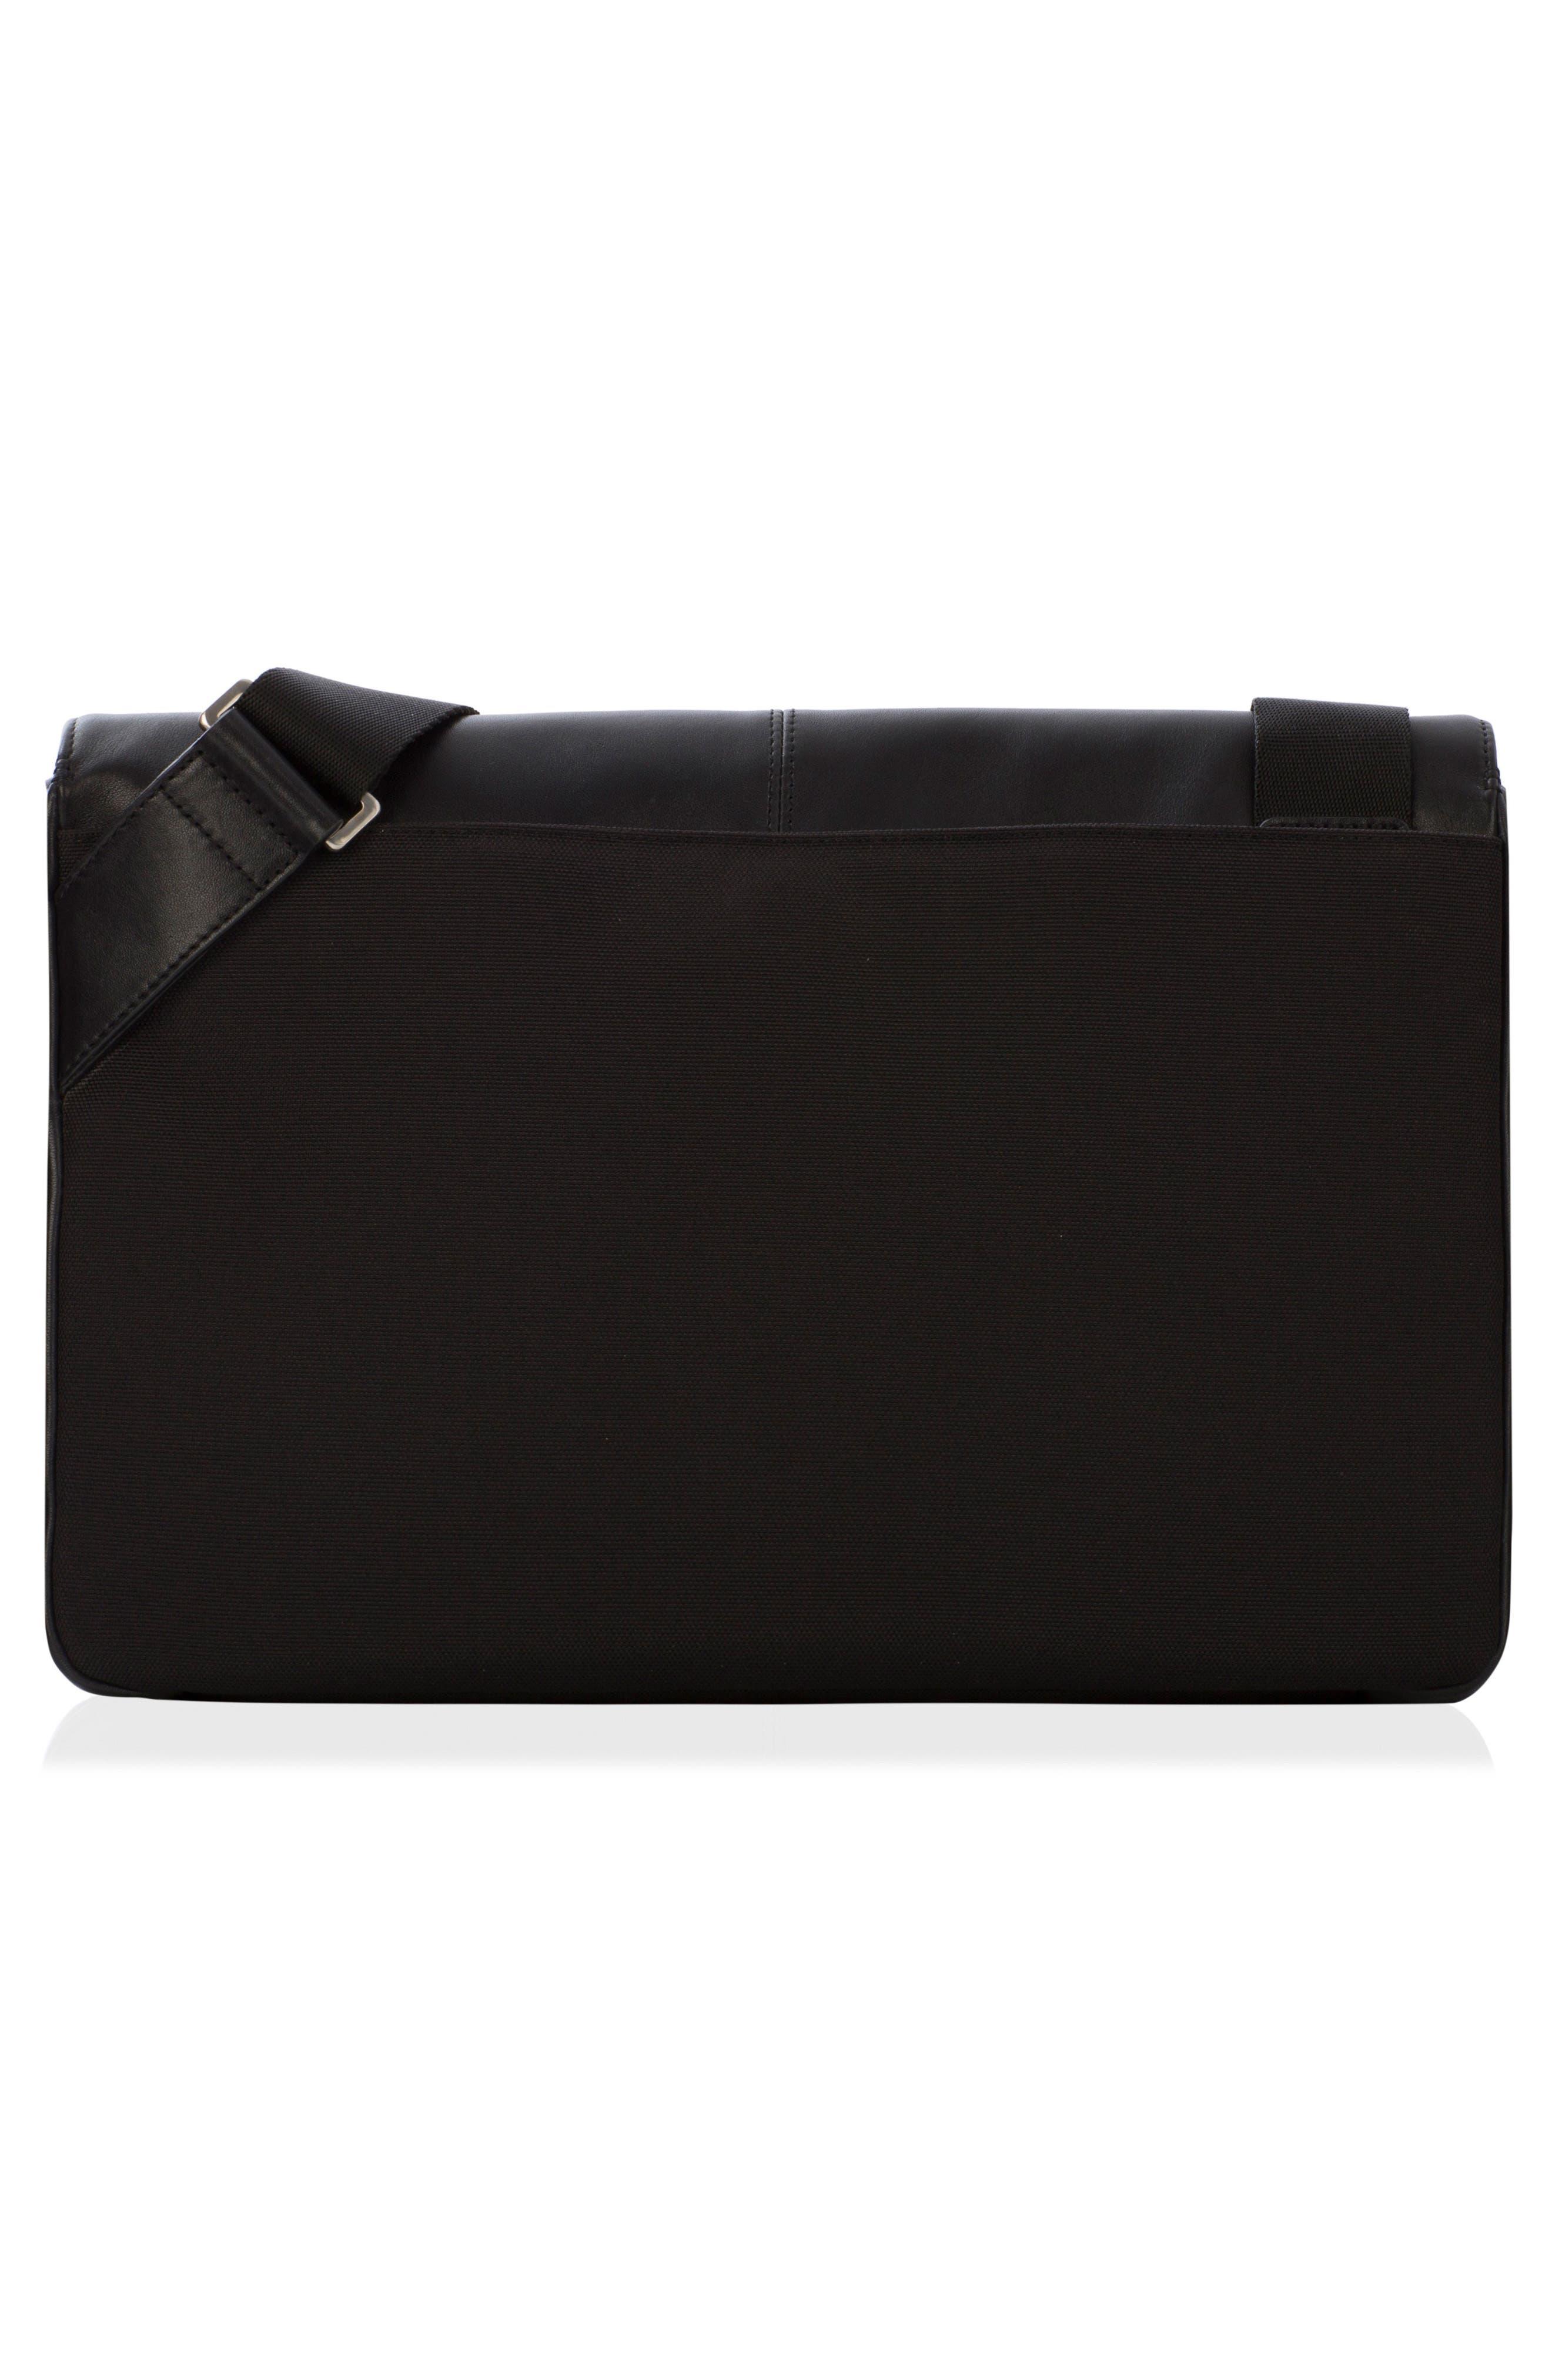 Brompton Kinsale RFID Leather Messenger Bag,                             Alternate thumbnail 2, color,                             001